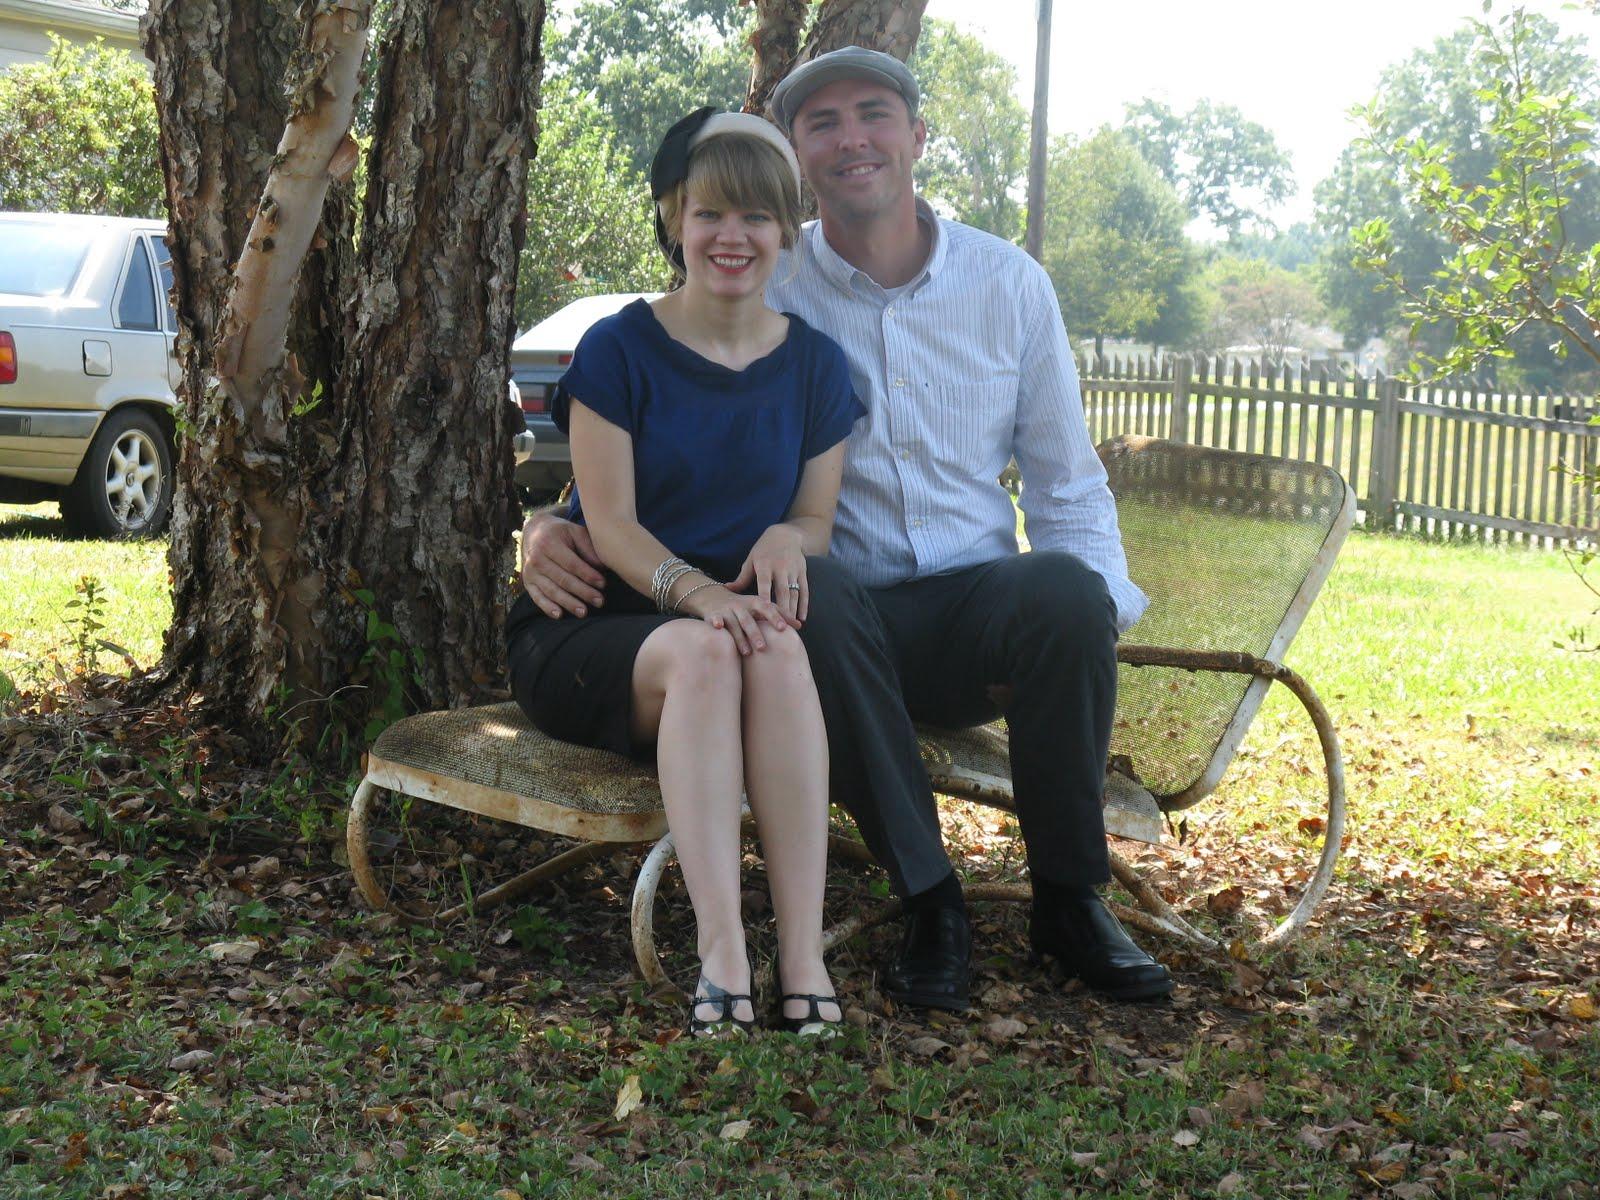 Craigslist winston salem dating